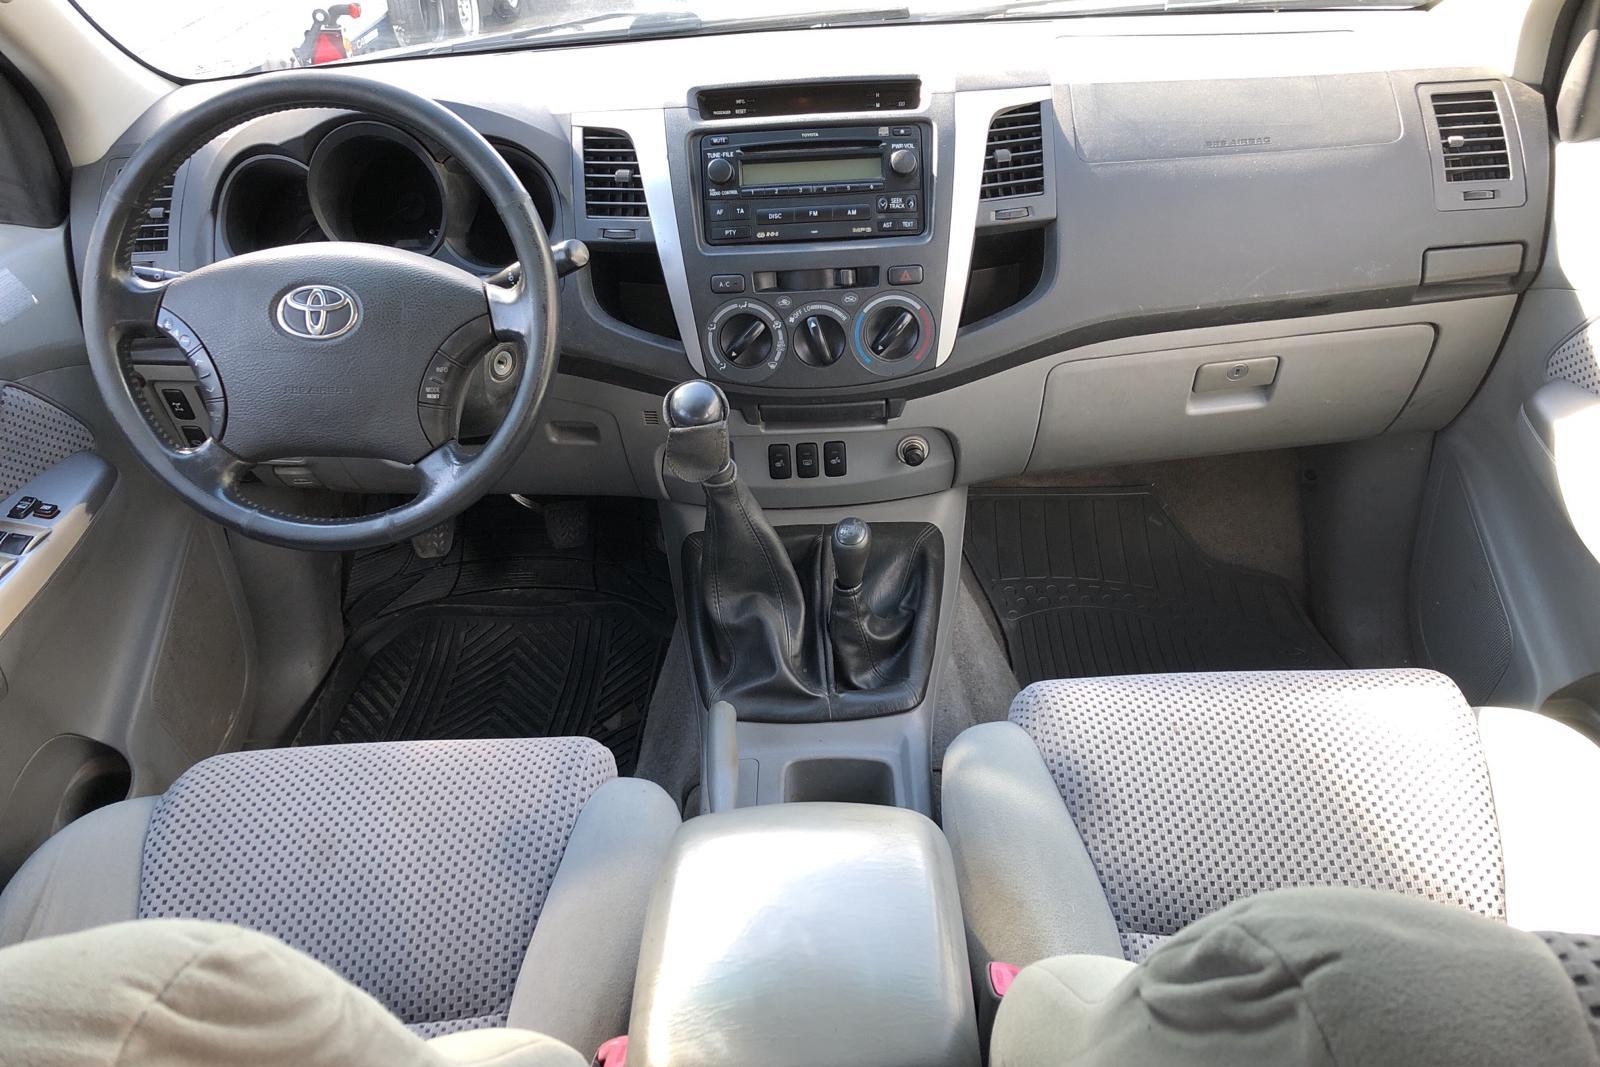 Toyota Hilux 2.5 D-4D 4WD (120hk) - 28 616 mil - Manuell - Light Brown - 2009